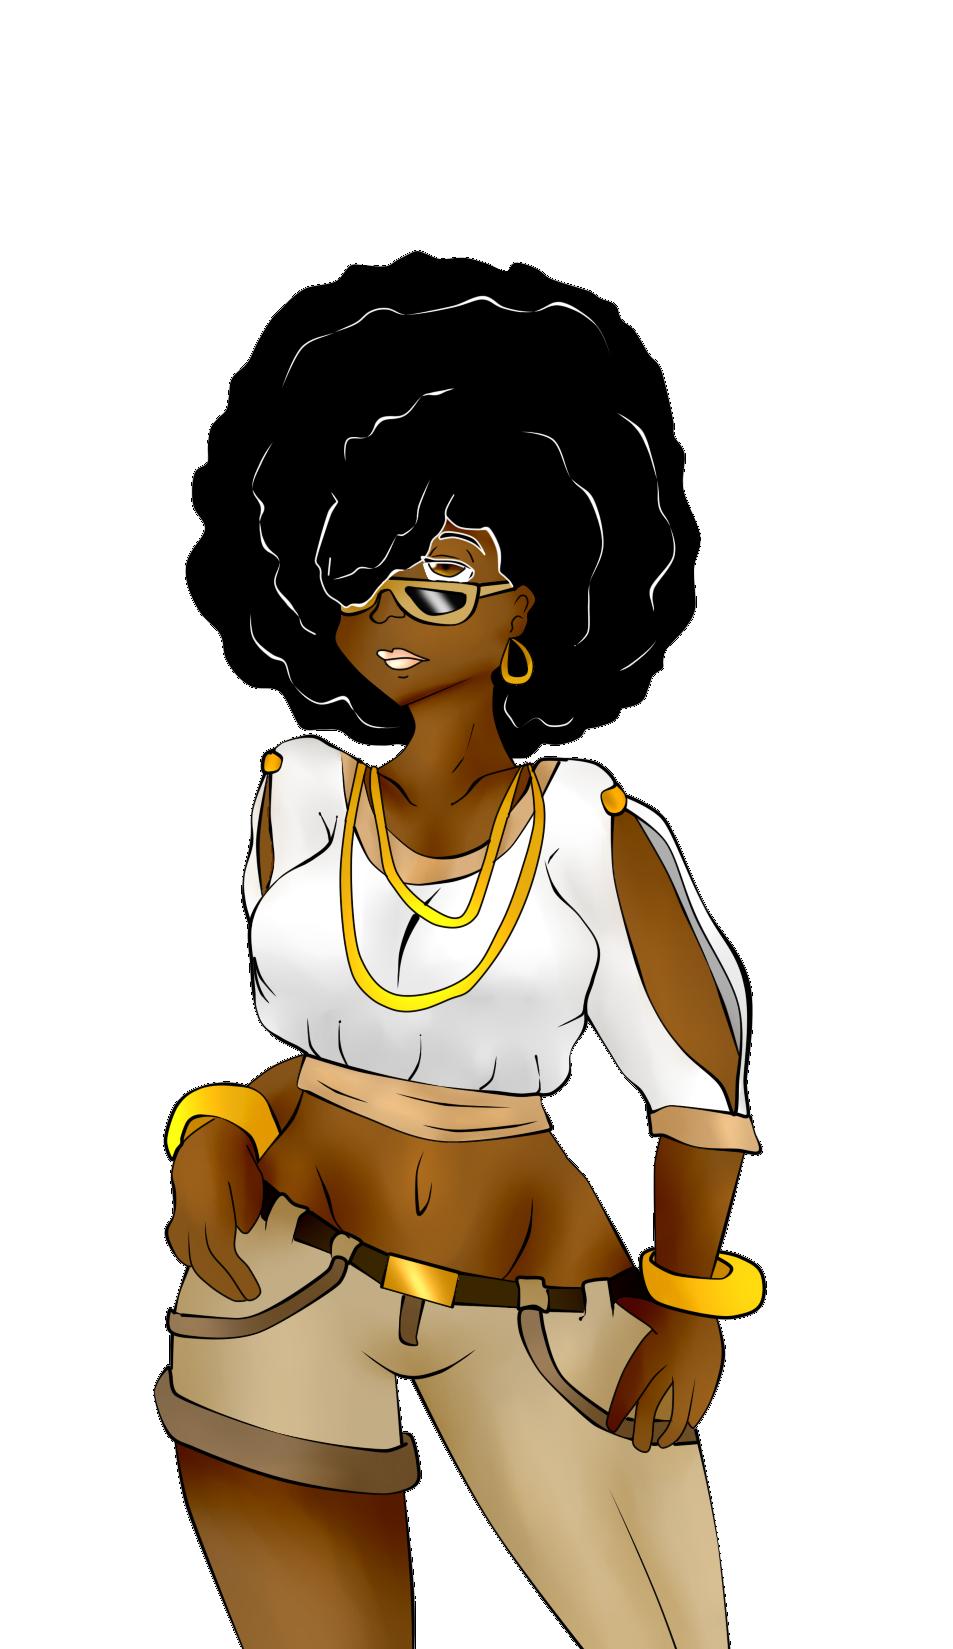 Afro girl in 2019.